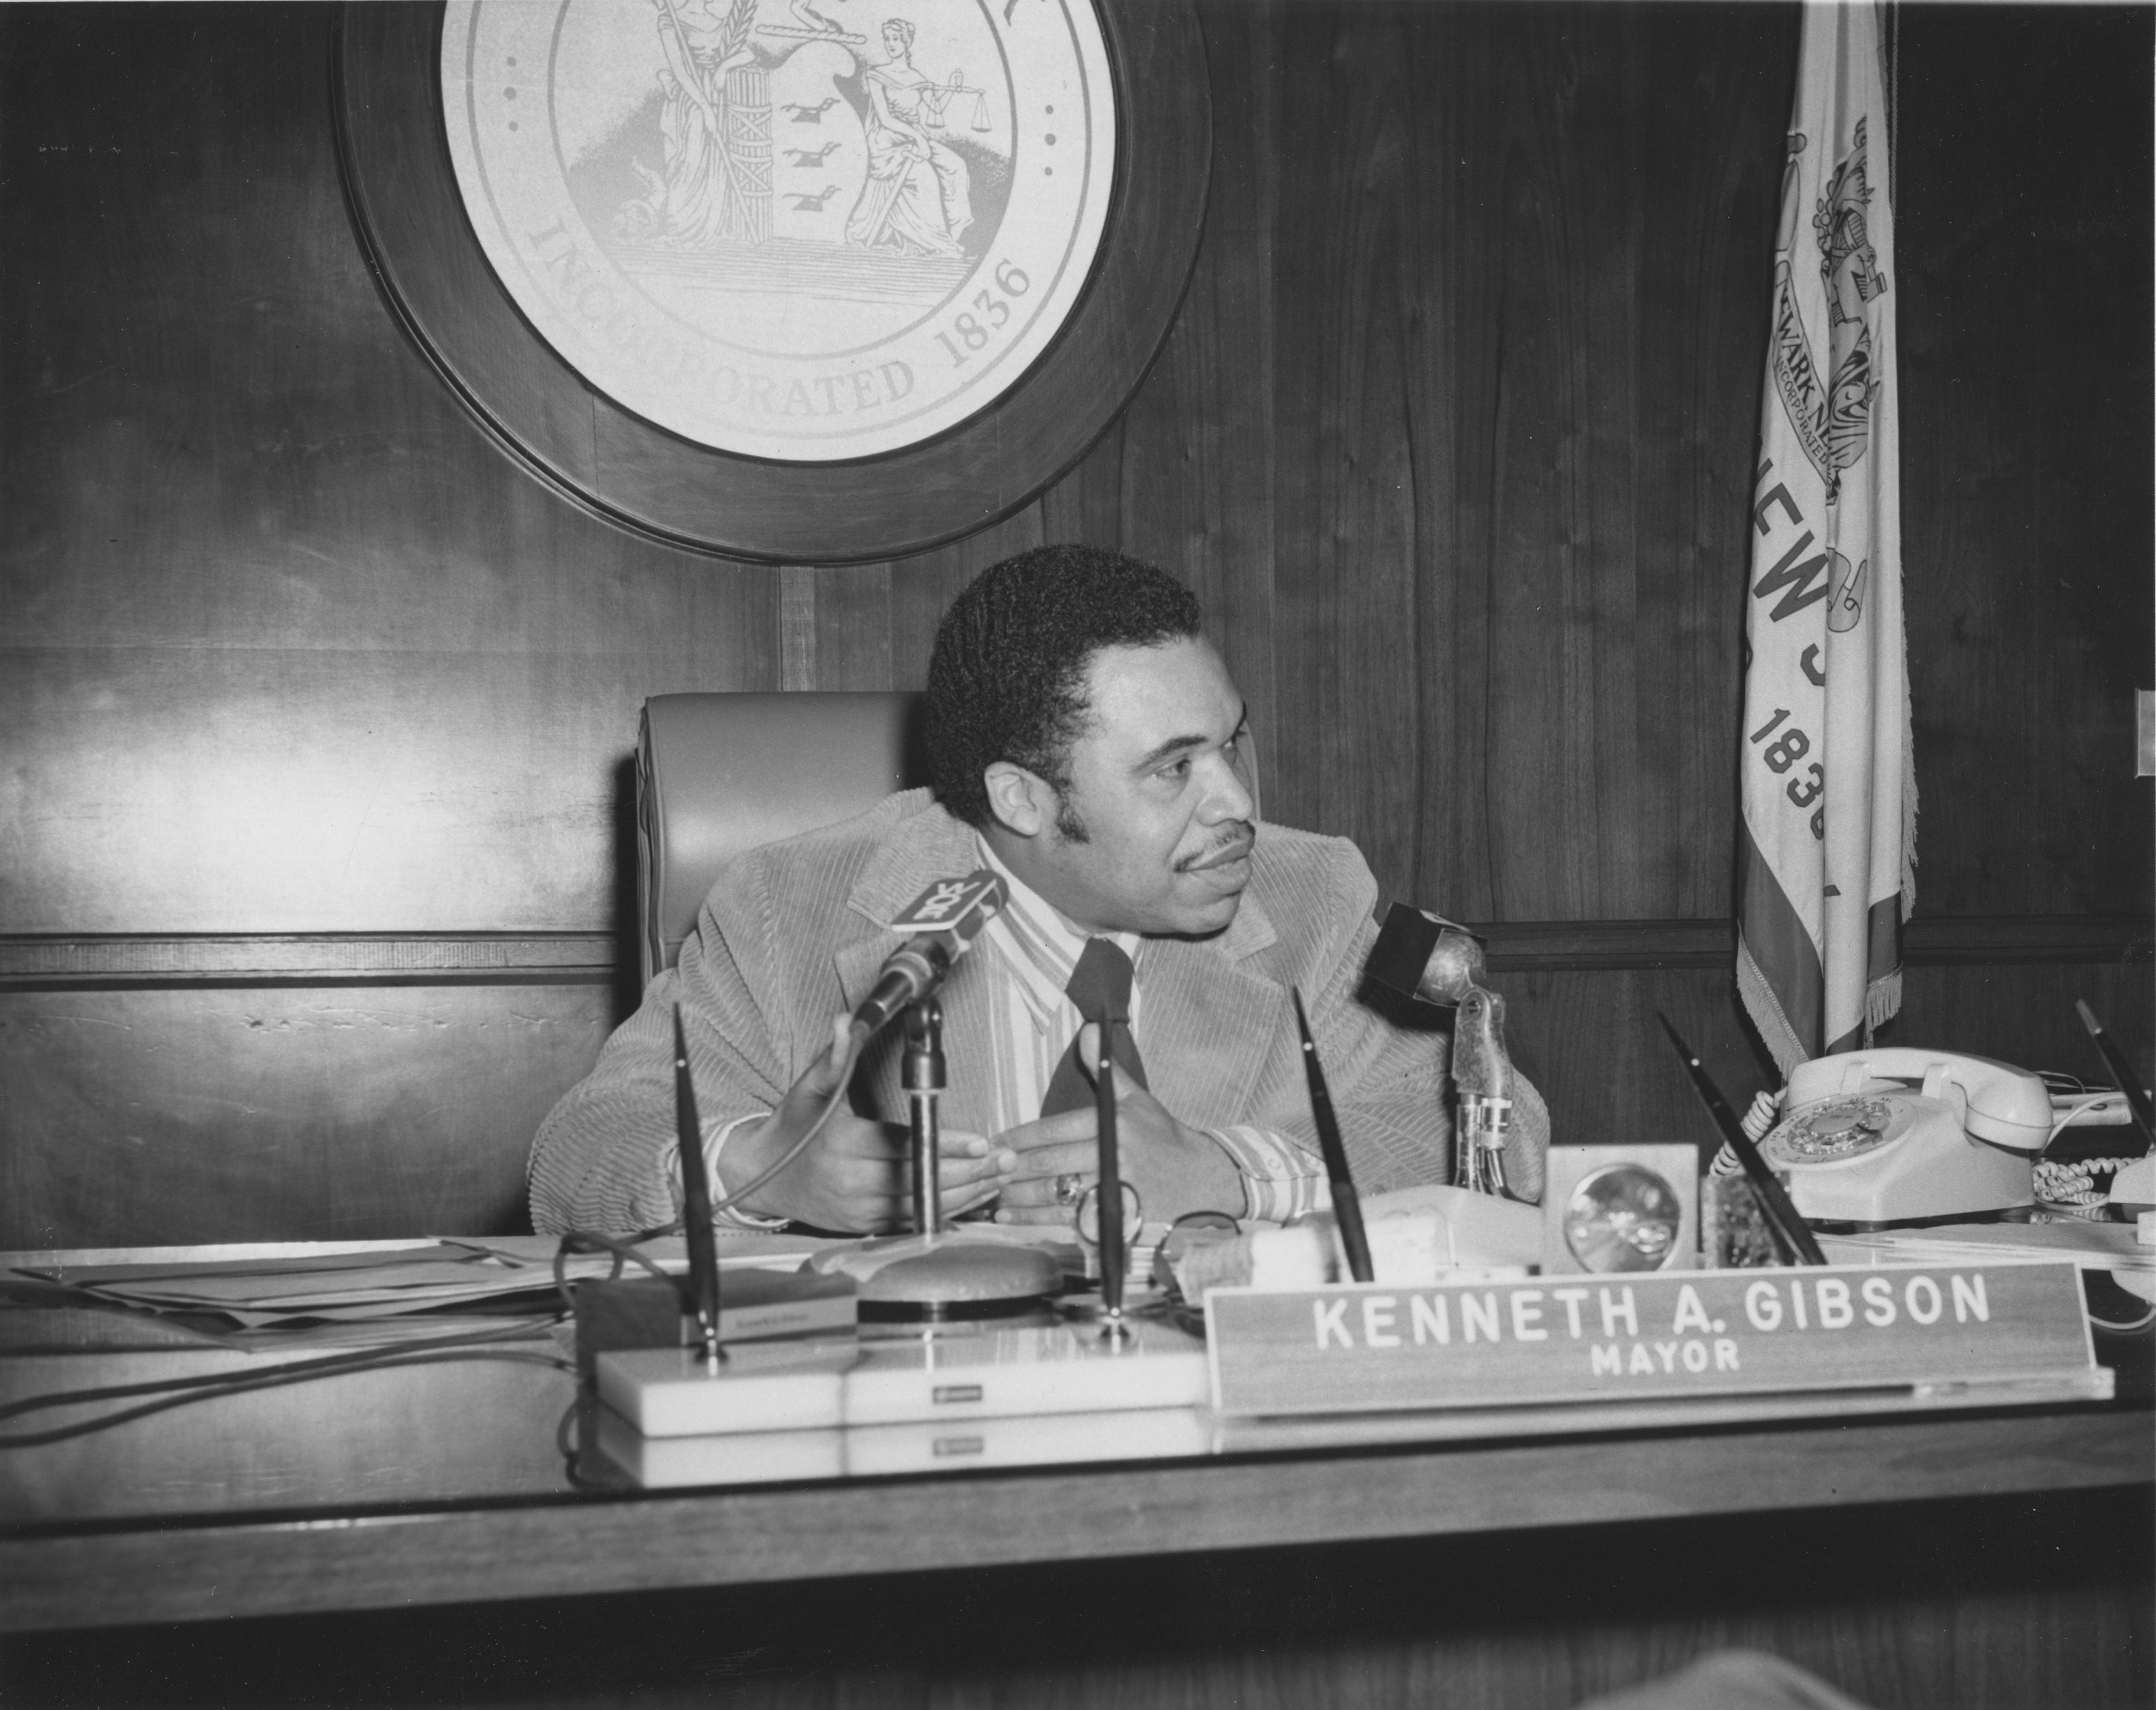 Ken Gibson in the Mayor's Office - The North | Newark